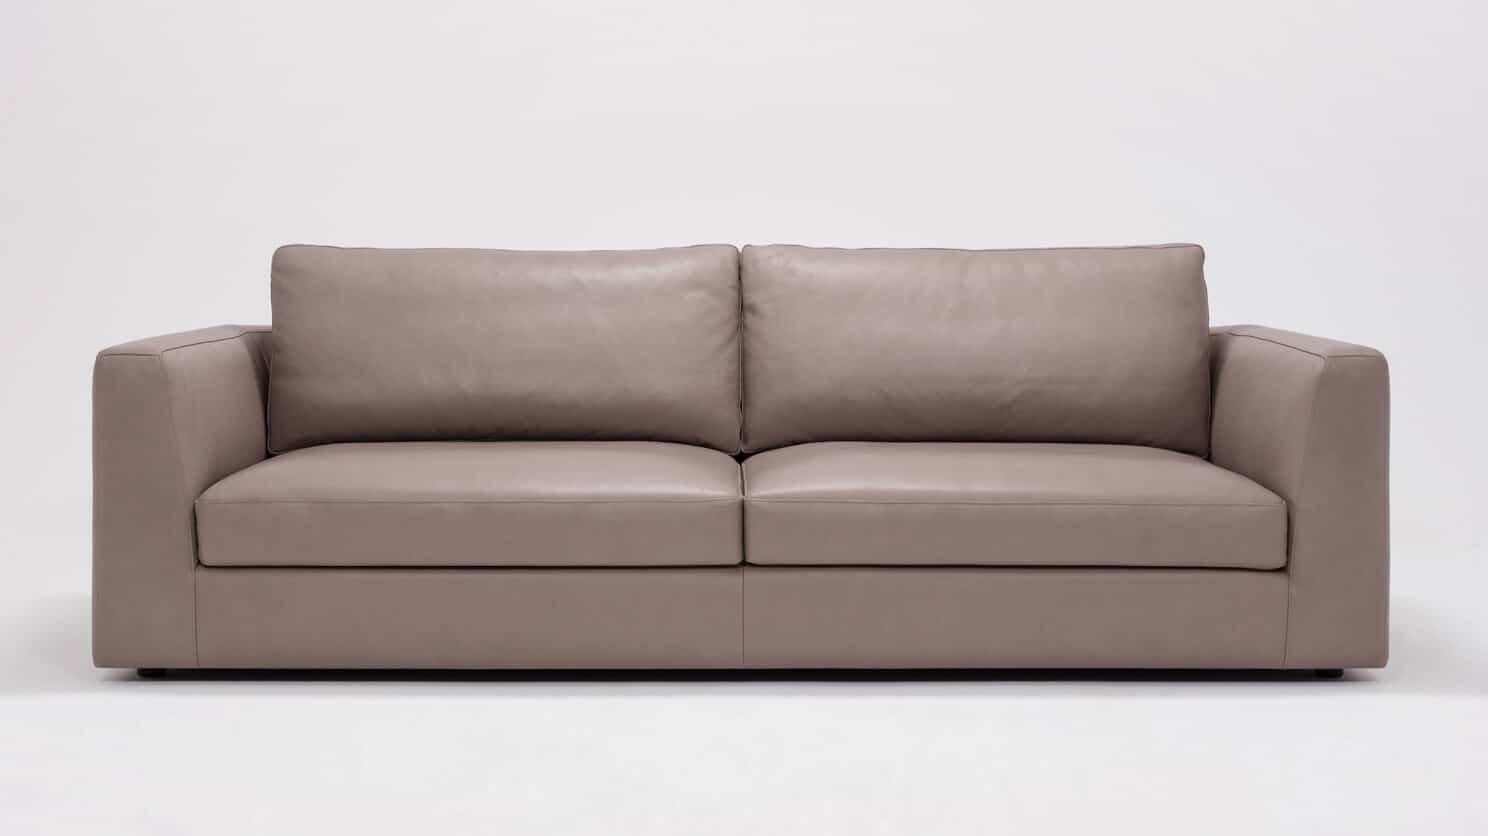 37136 01 01 sofa cello suave chrome front view 1